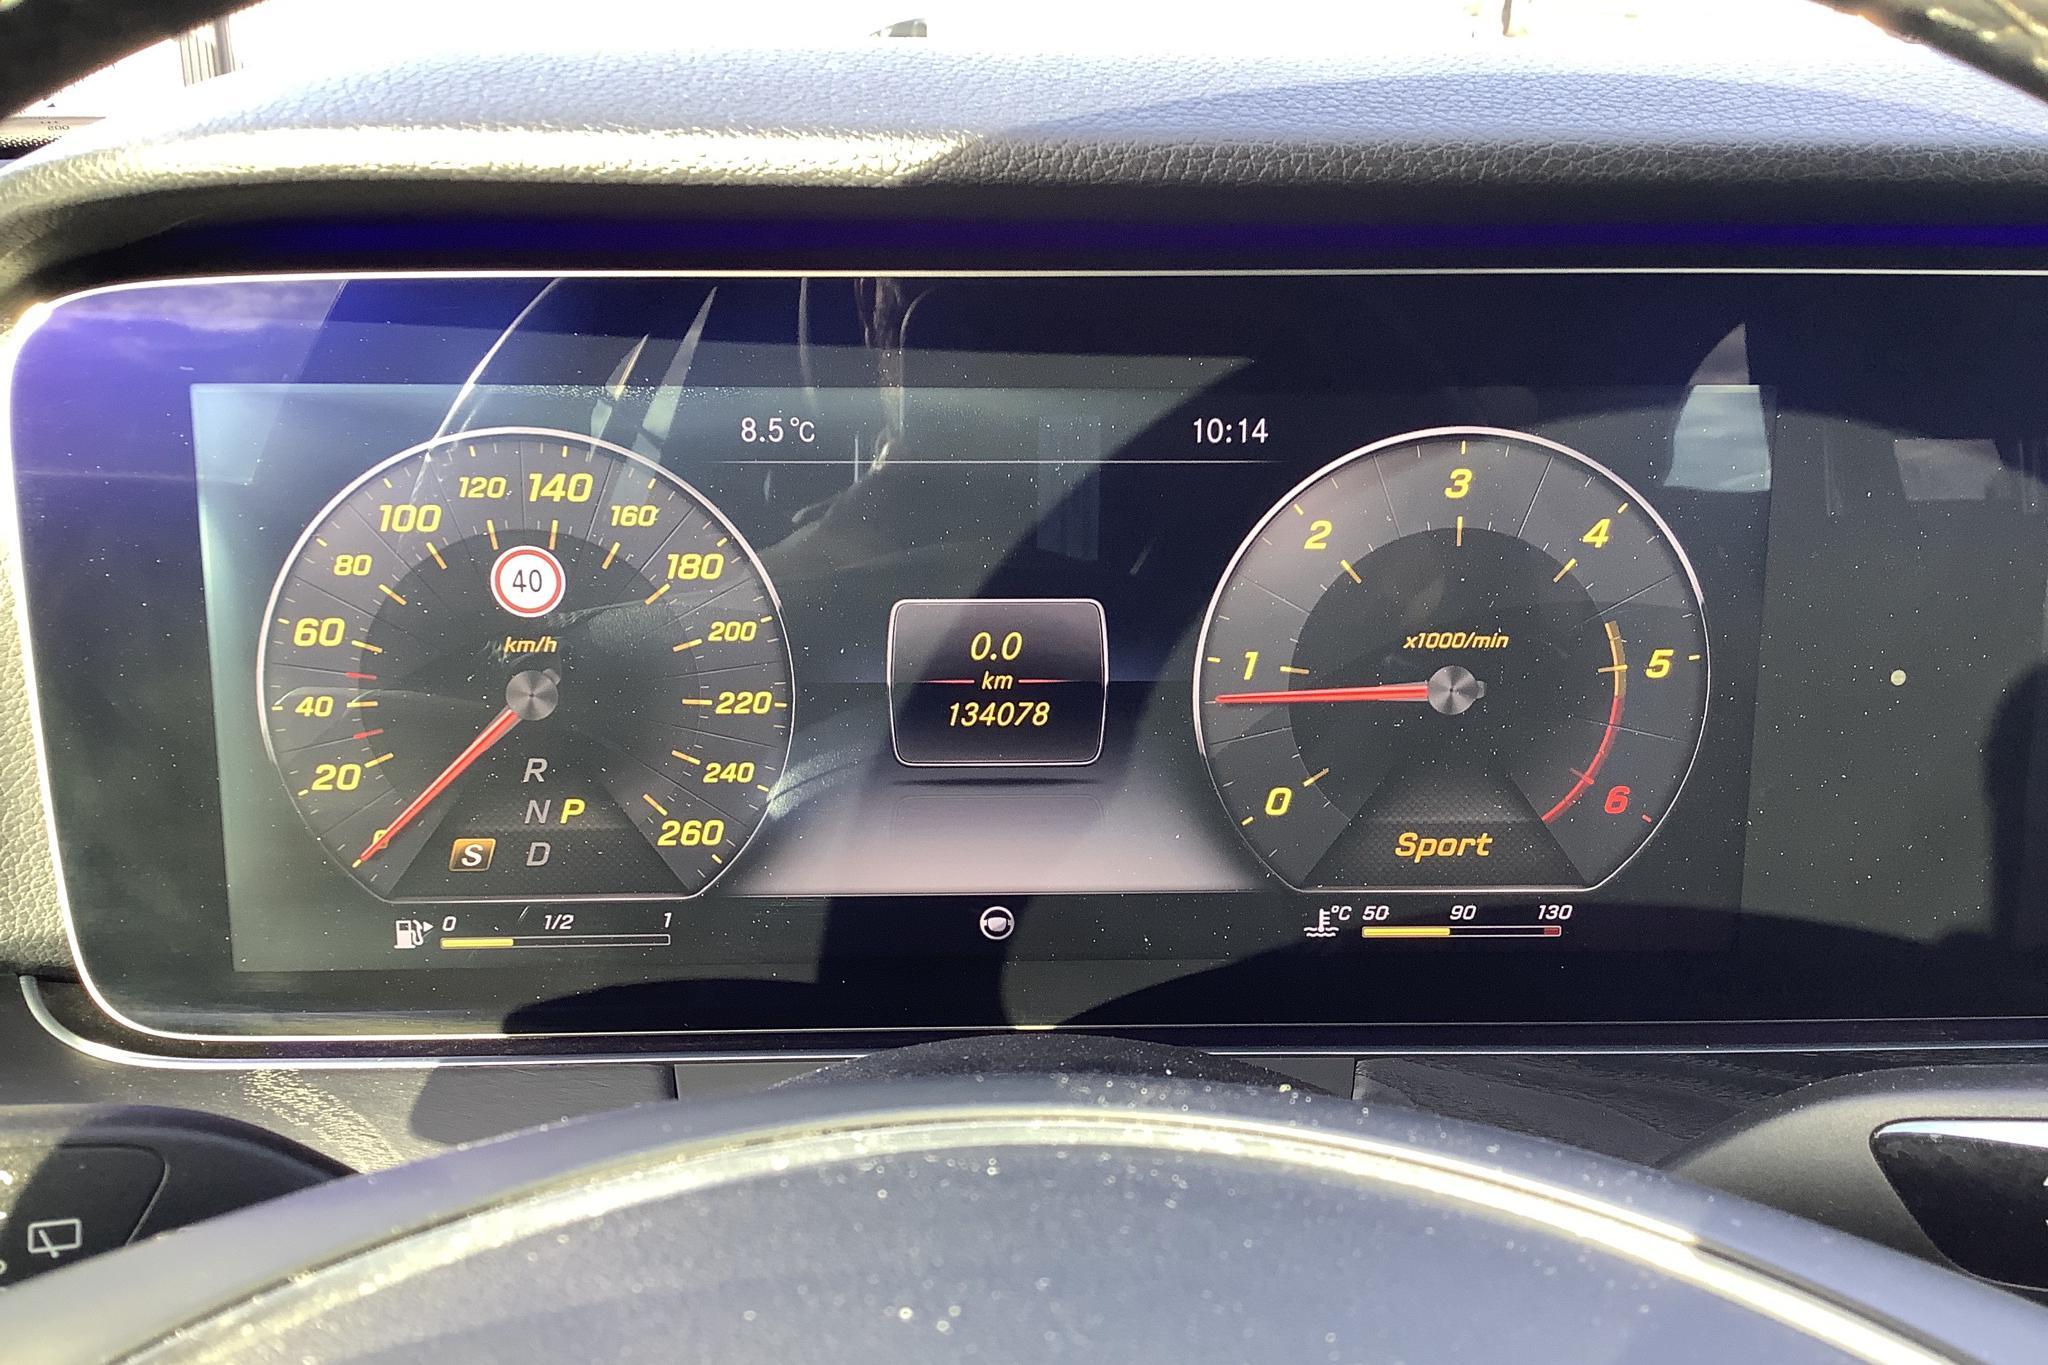 Mercedes E 220 d 4MATIC Kombi All-Terrain S213 (194hk) - 13 500 mil - röd - 2017